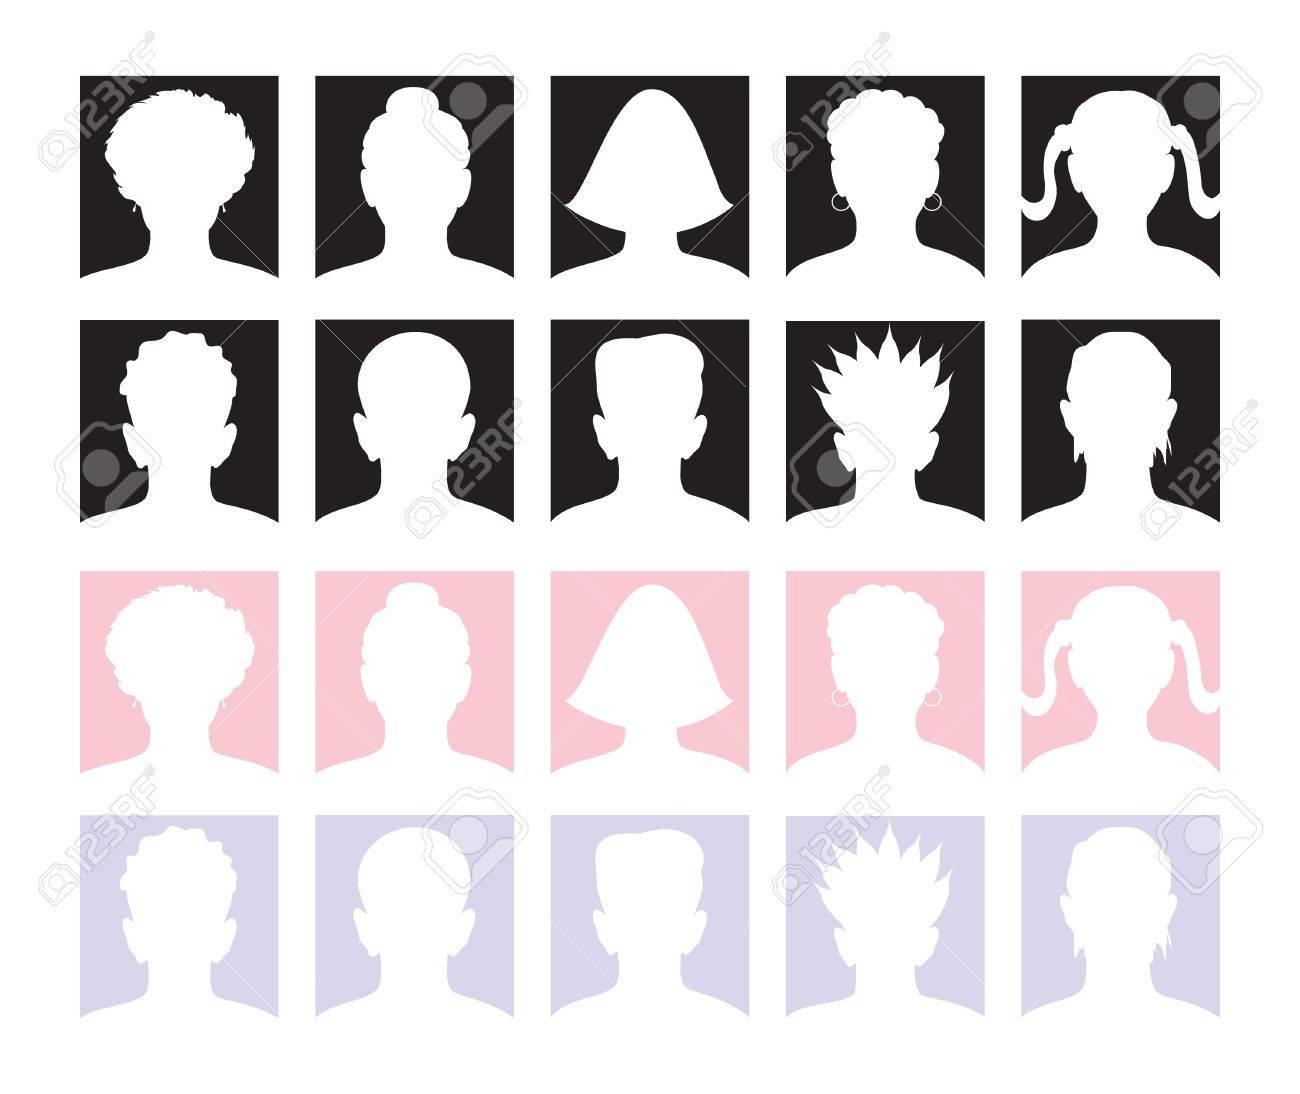 10 Anonymous Avatars and Mugshots